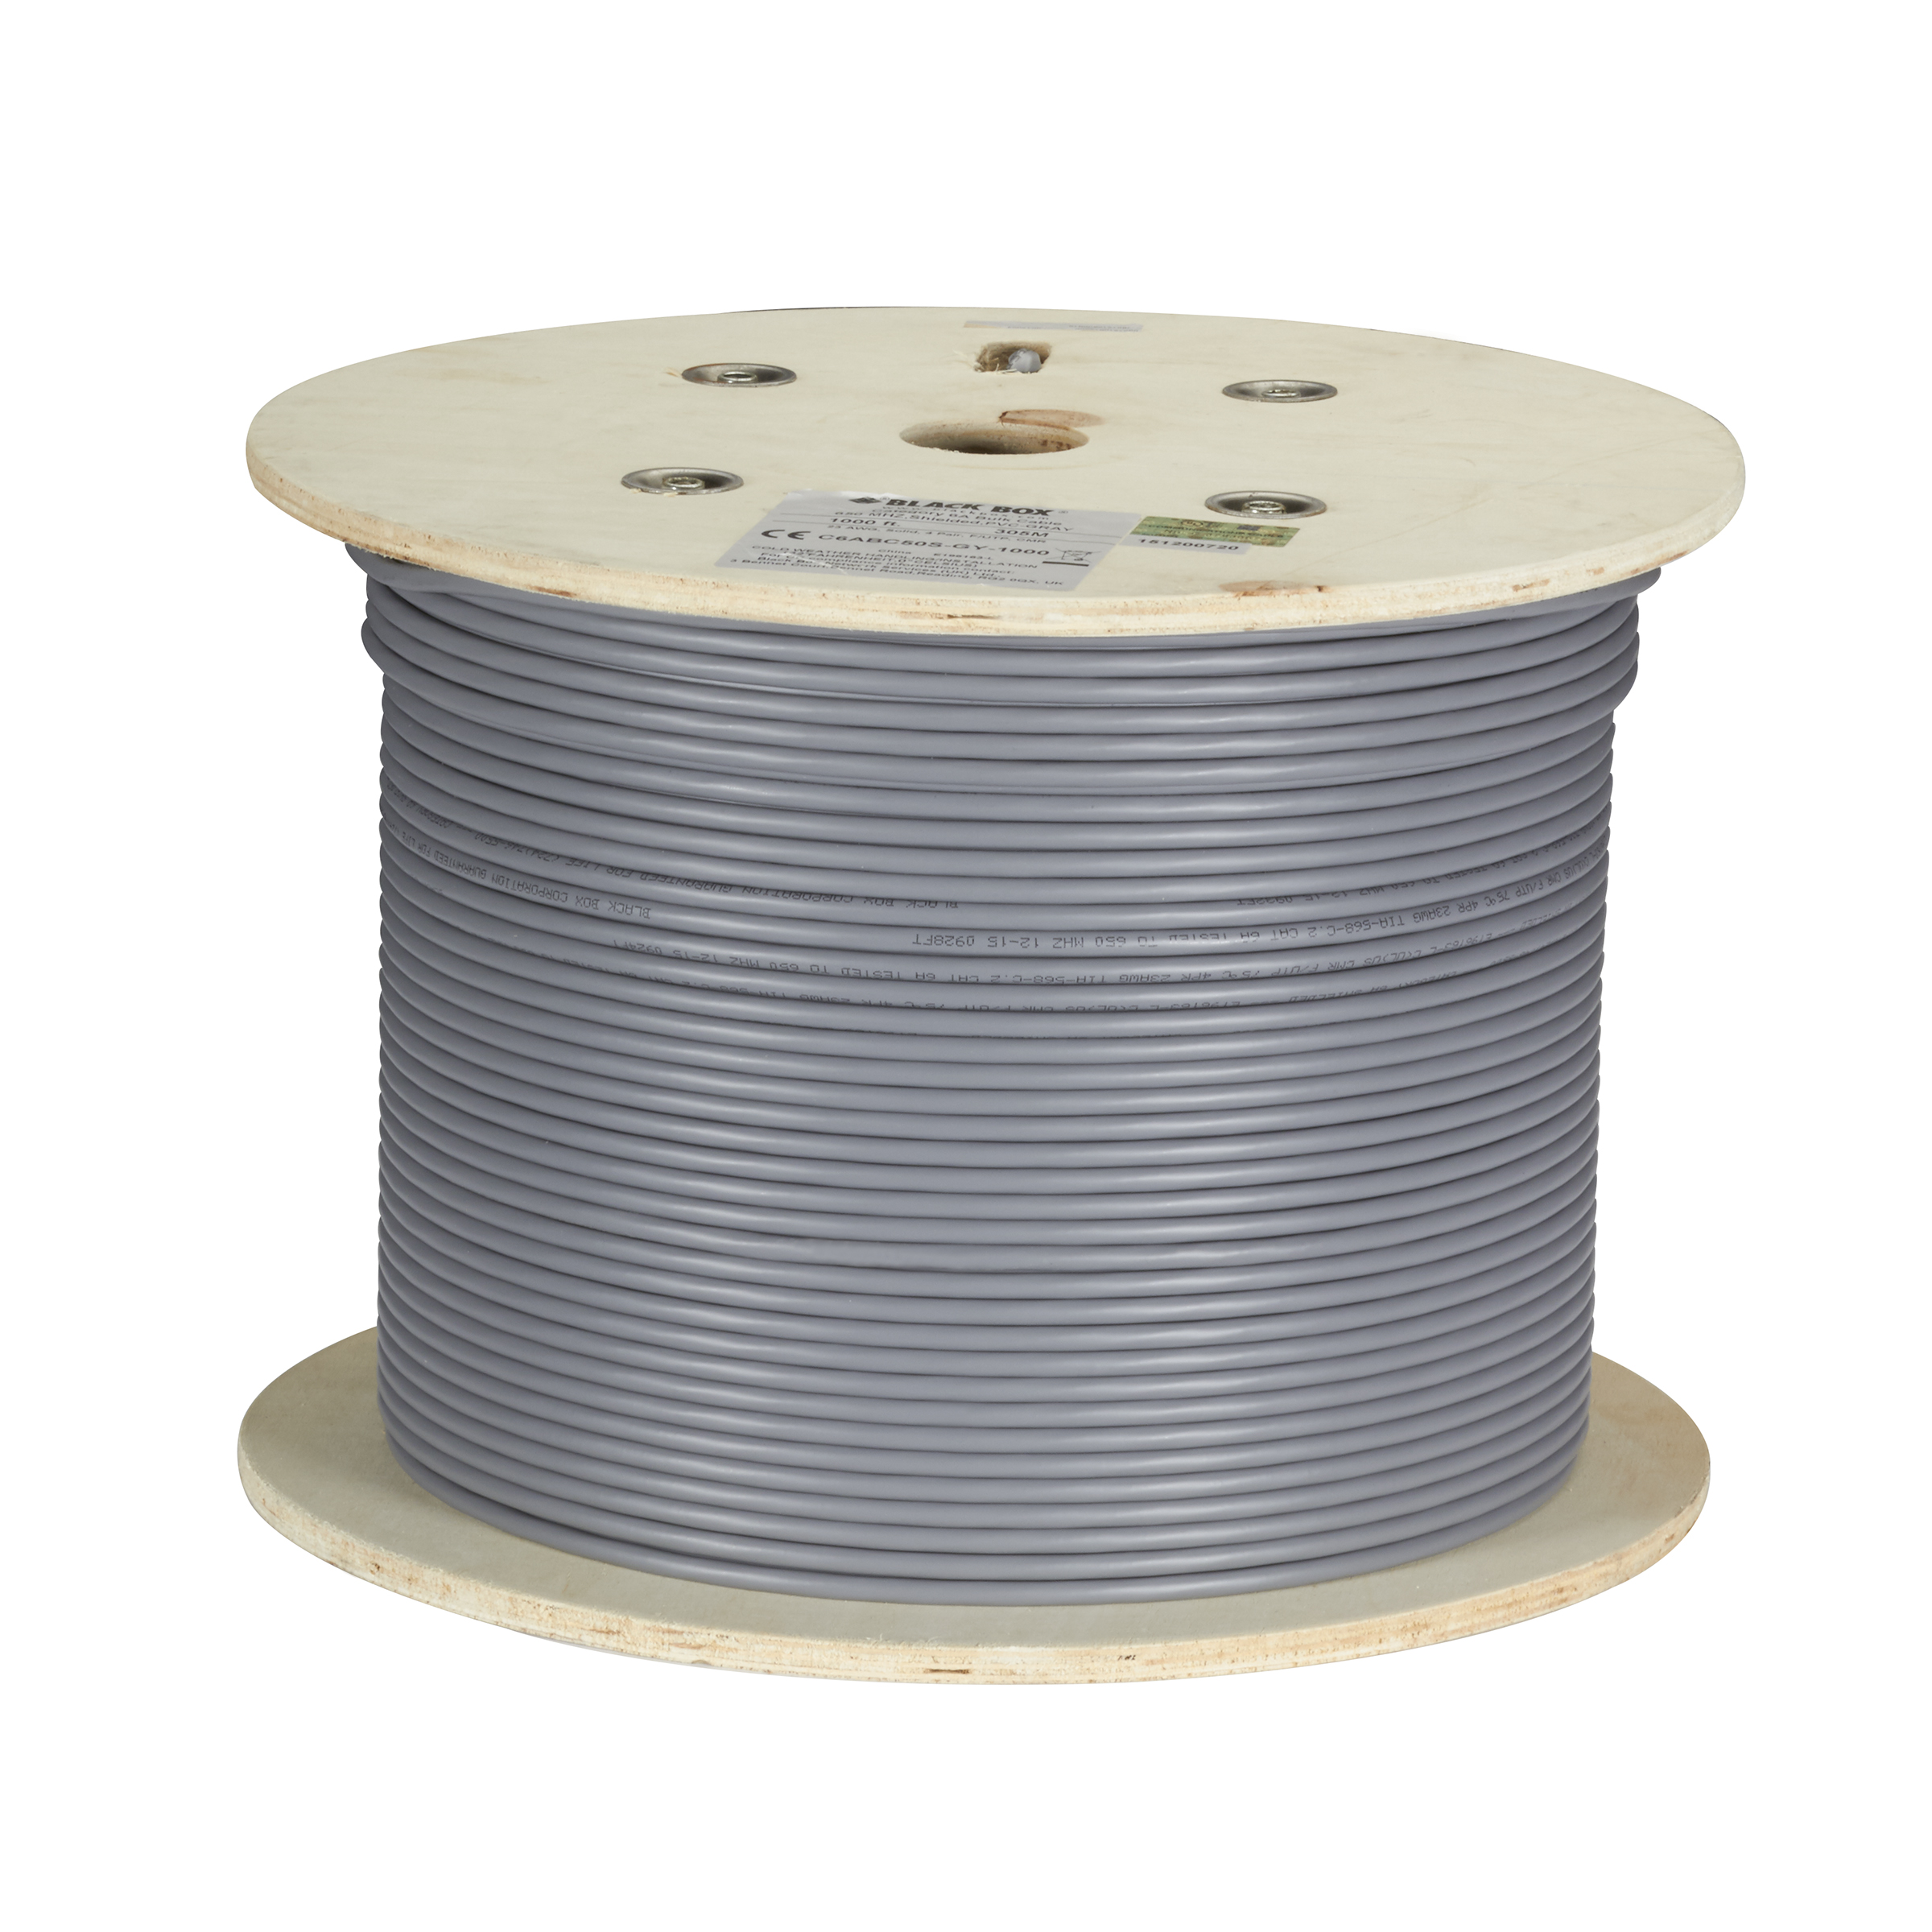 1000\' CAT6A 650MHz Solid Bulk Cable F/UTP CMP Gray | Black Box